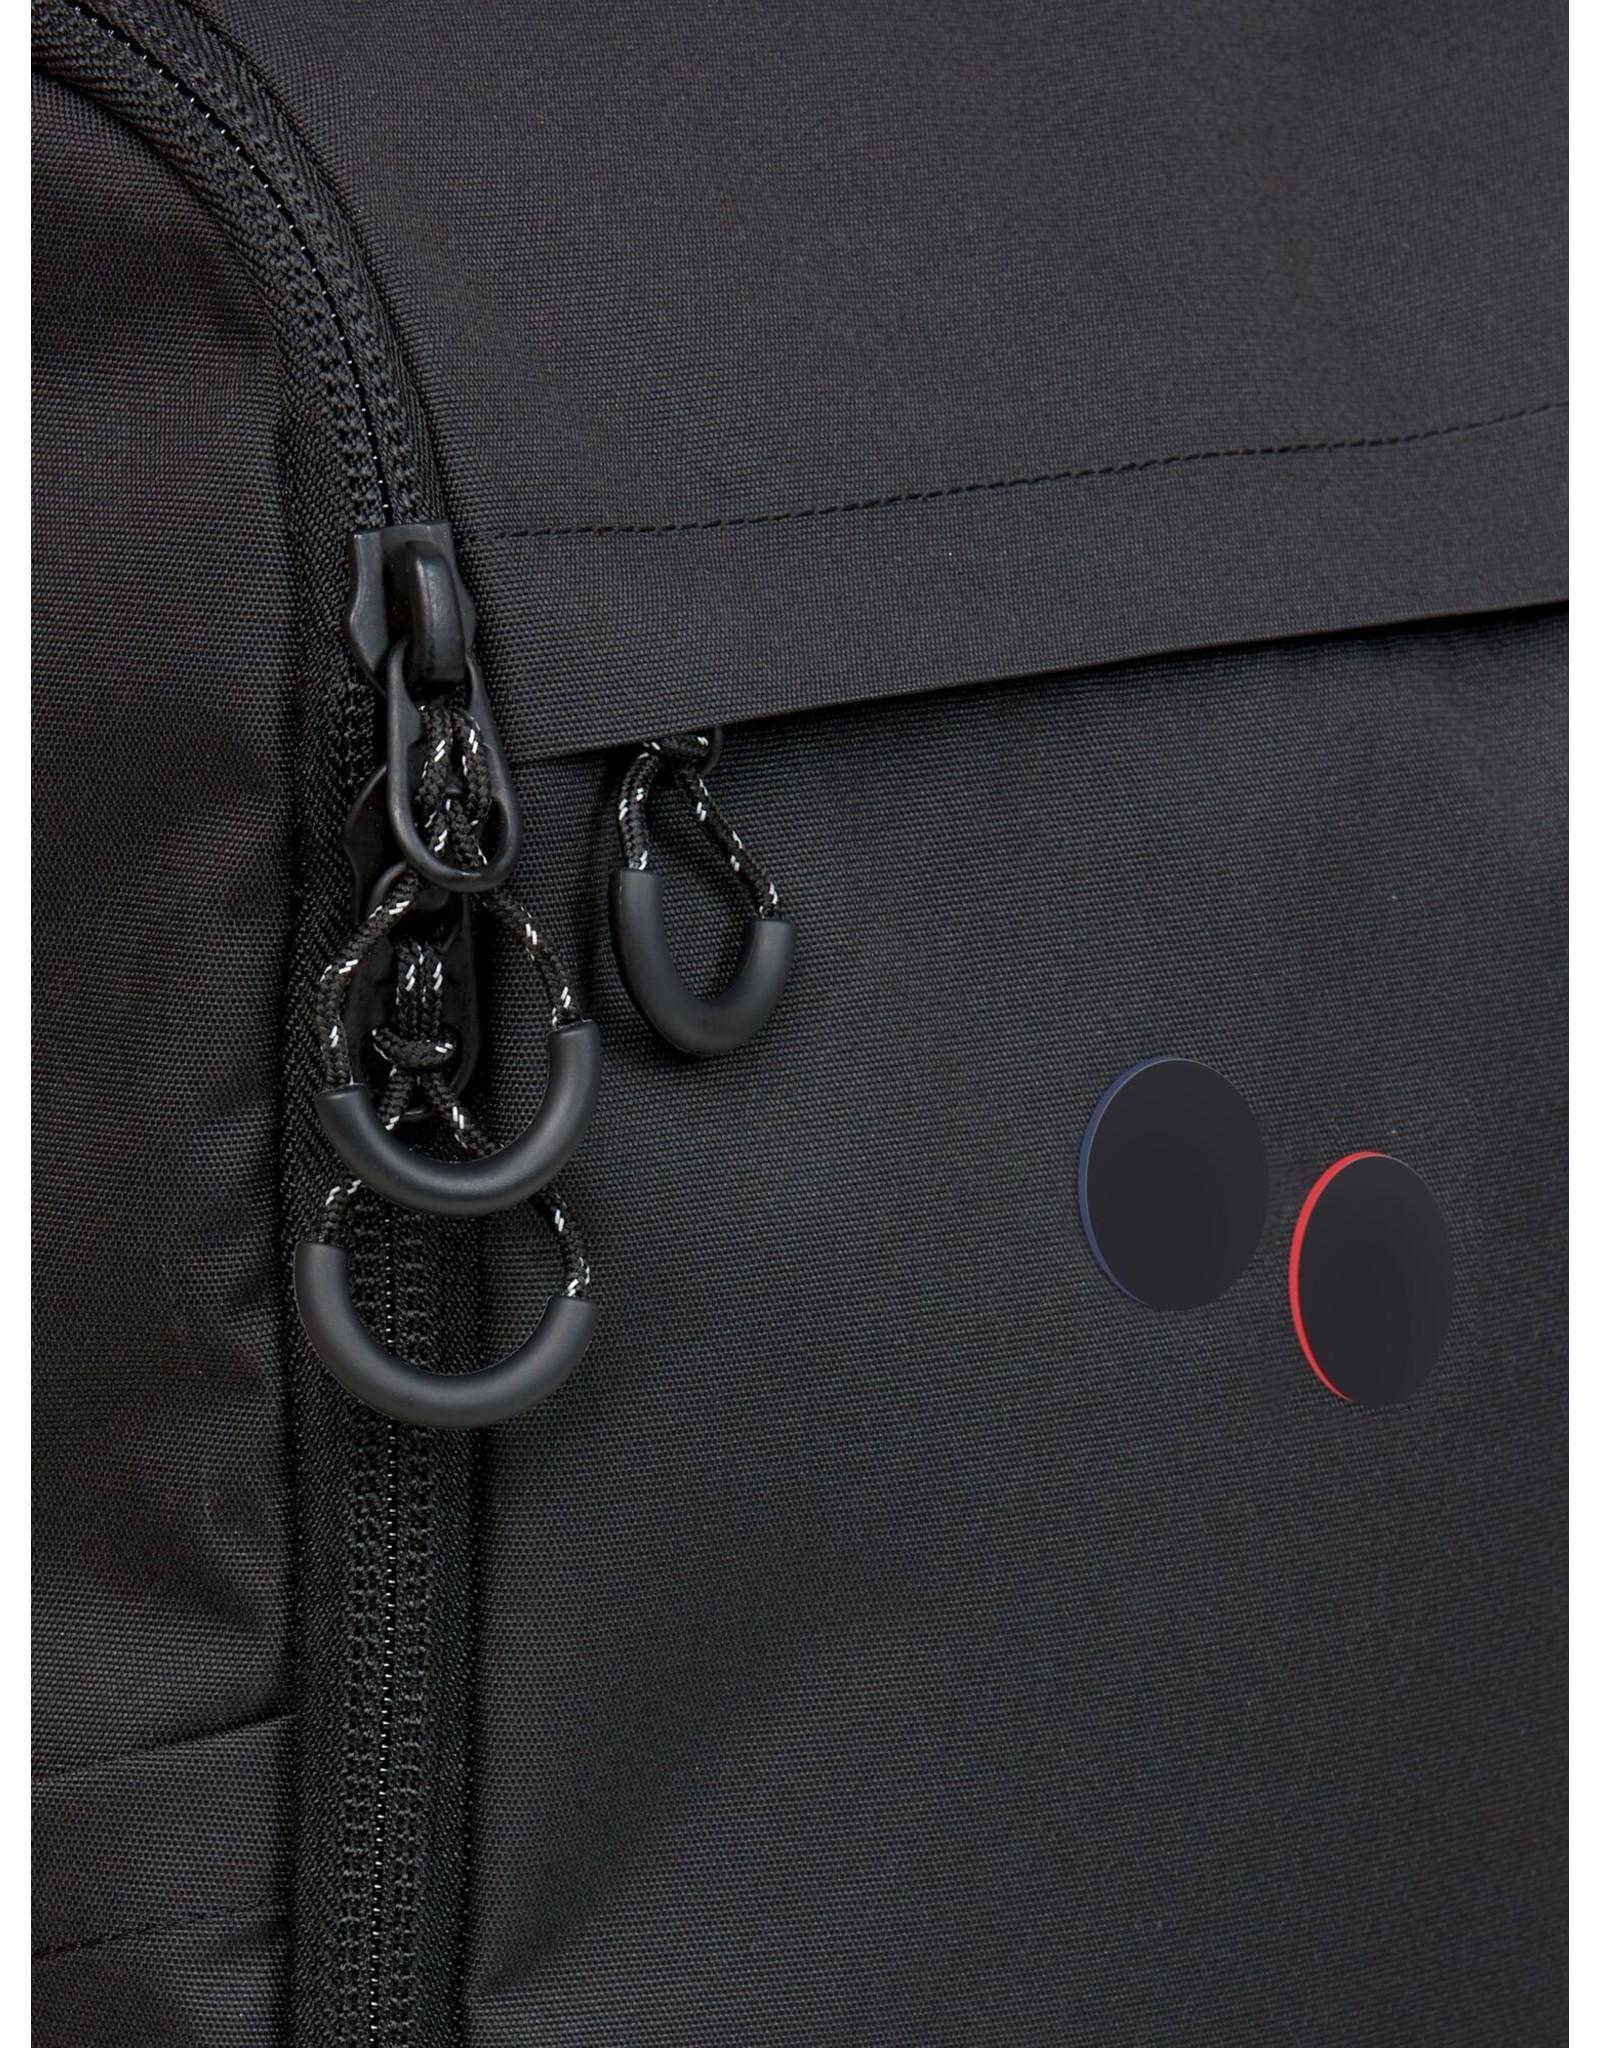 pinqponq PURIK Backpack